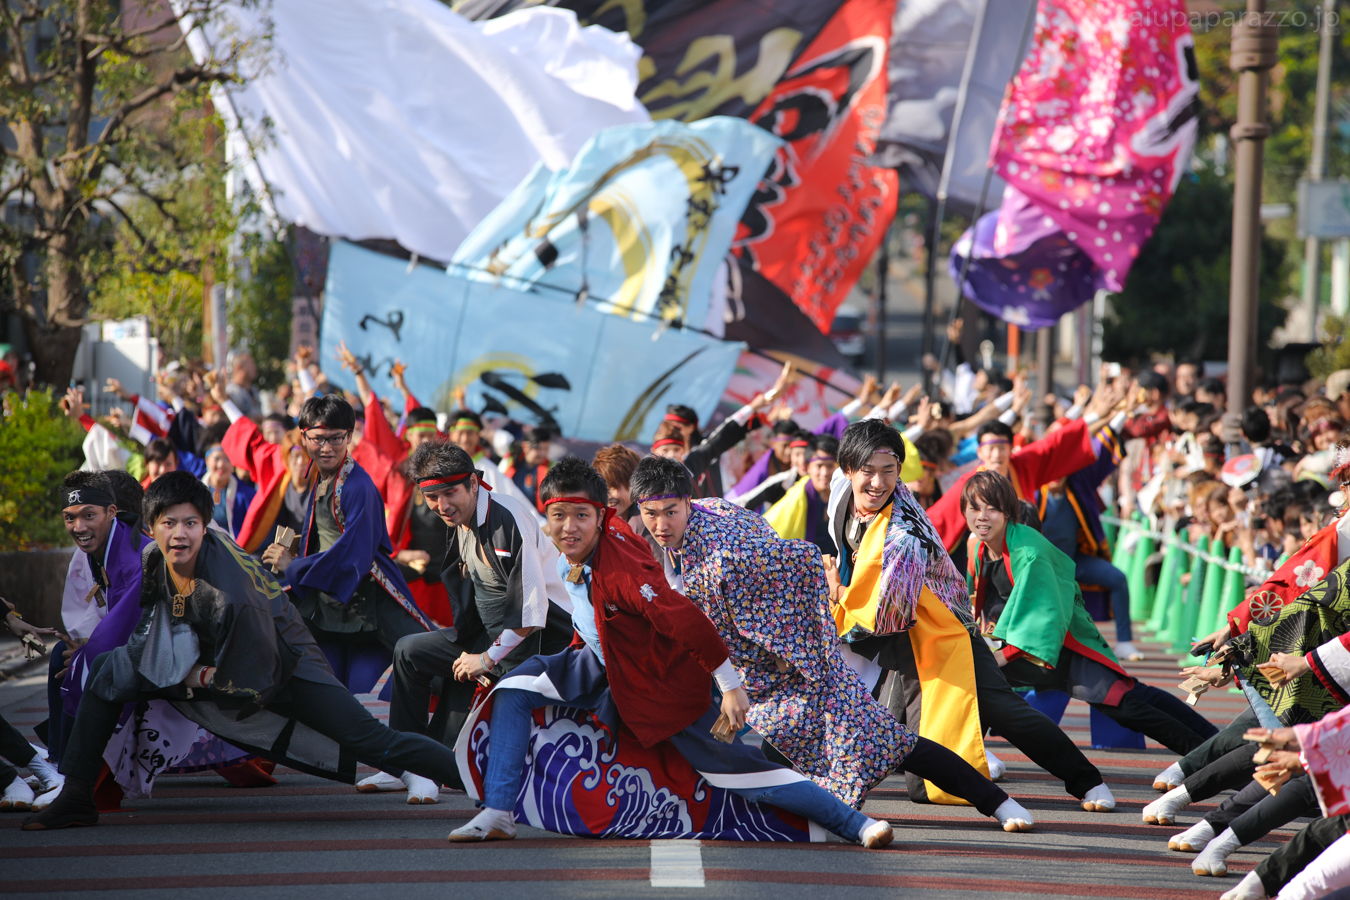 kanpachi2016oyachai-14.jpg